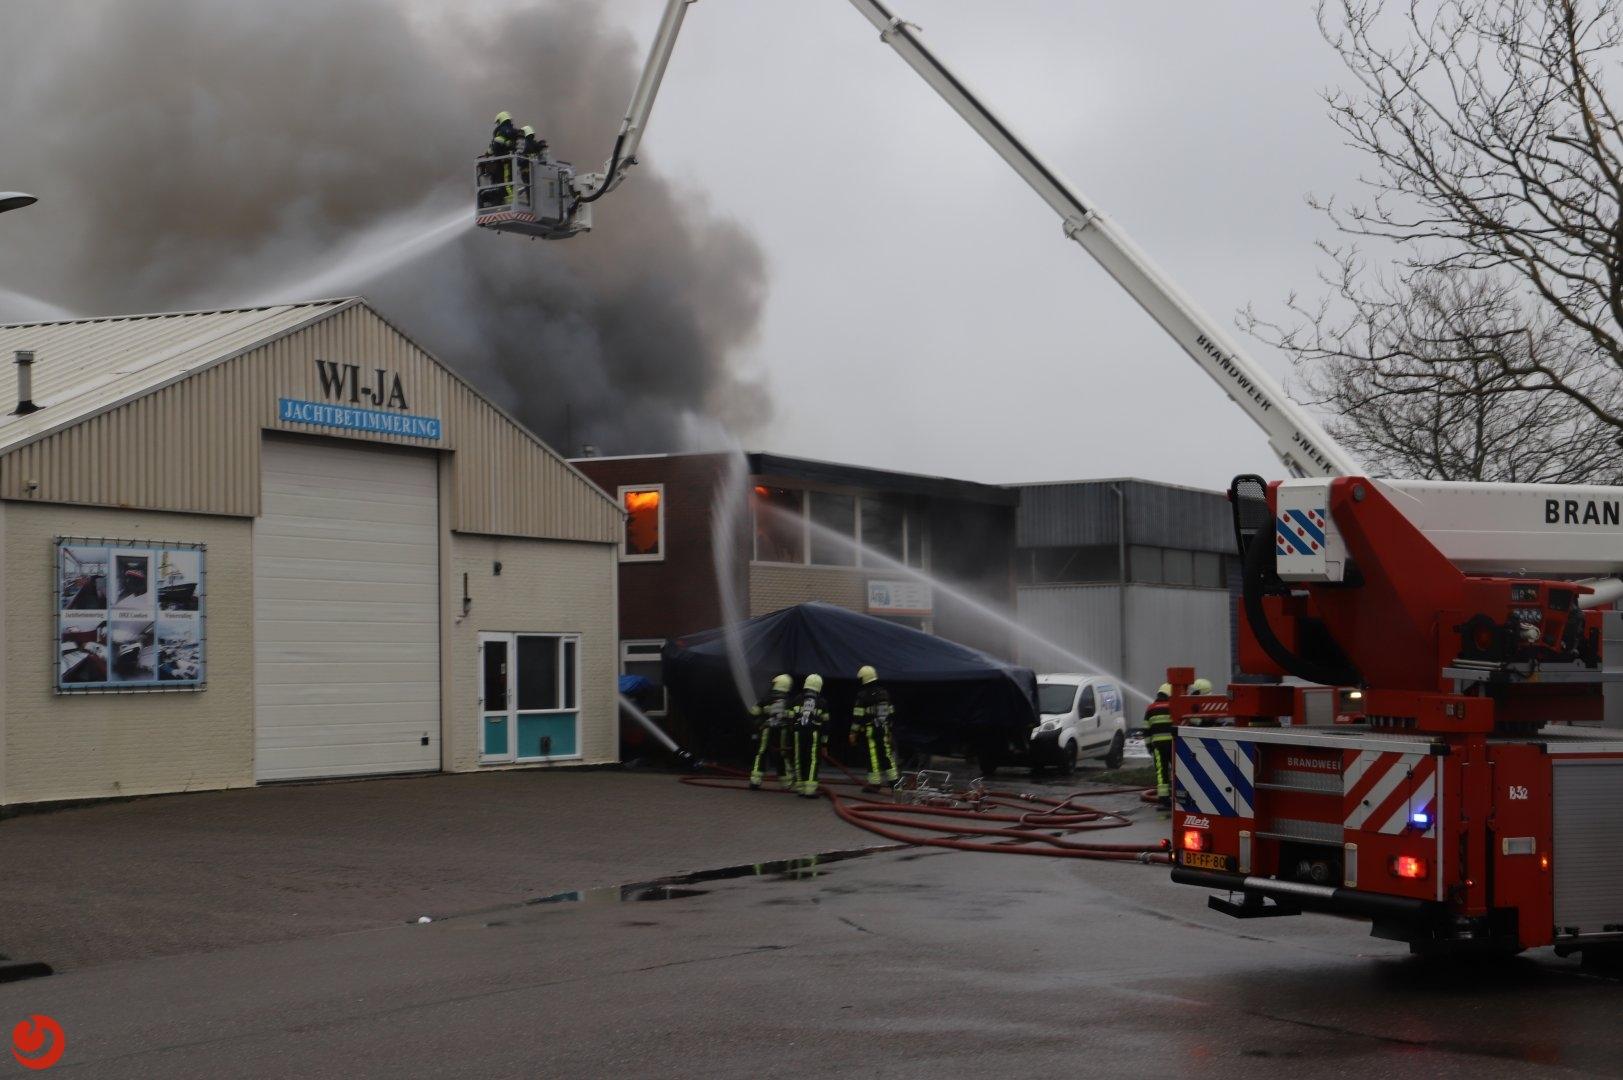 Grote brand verwoest loods met boten